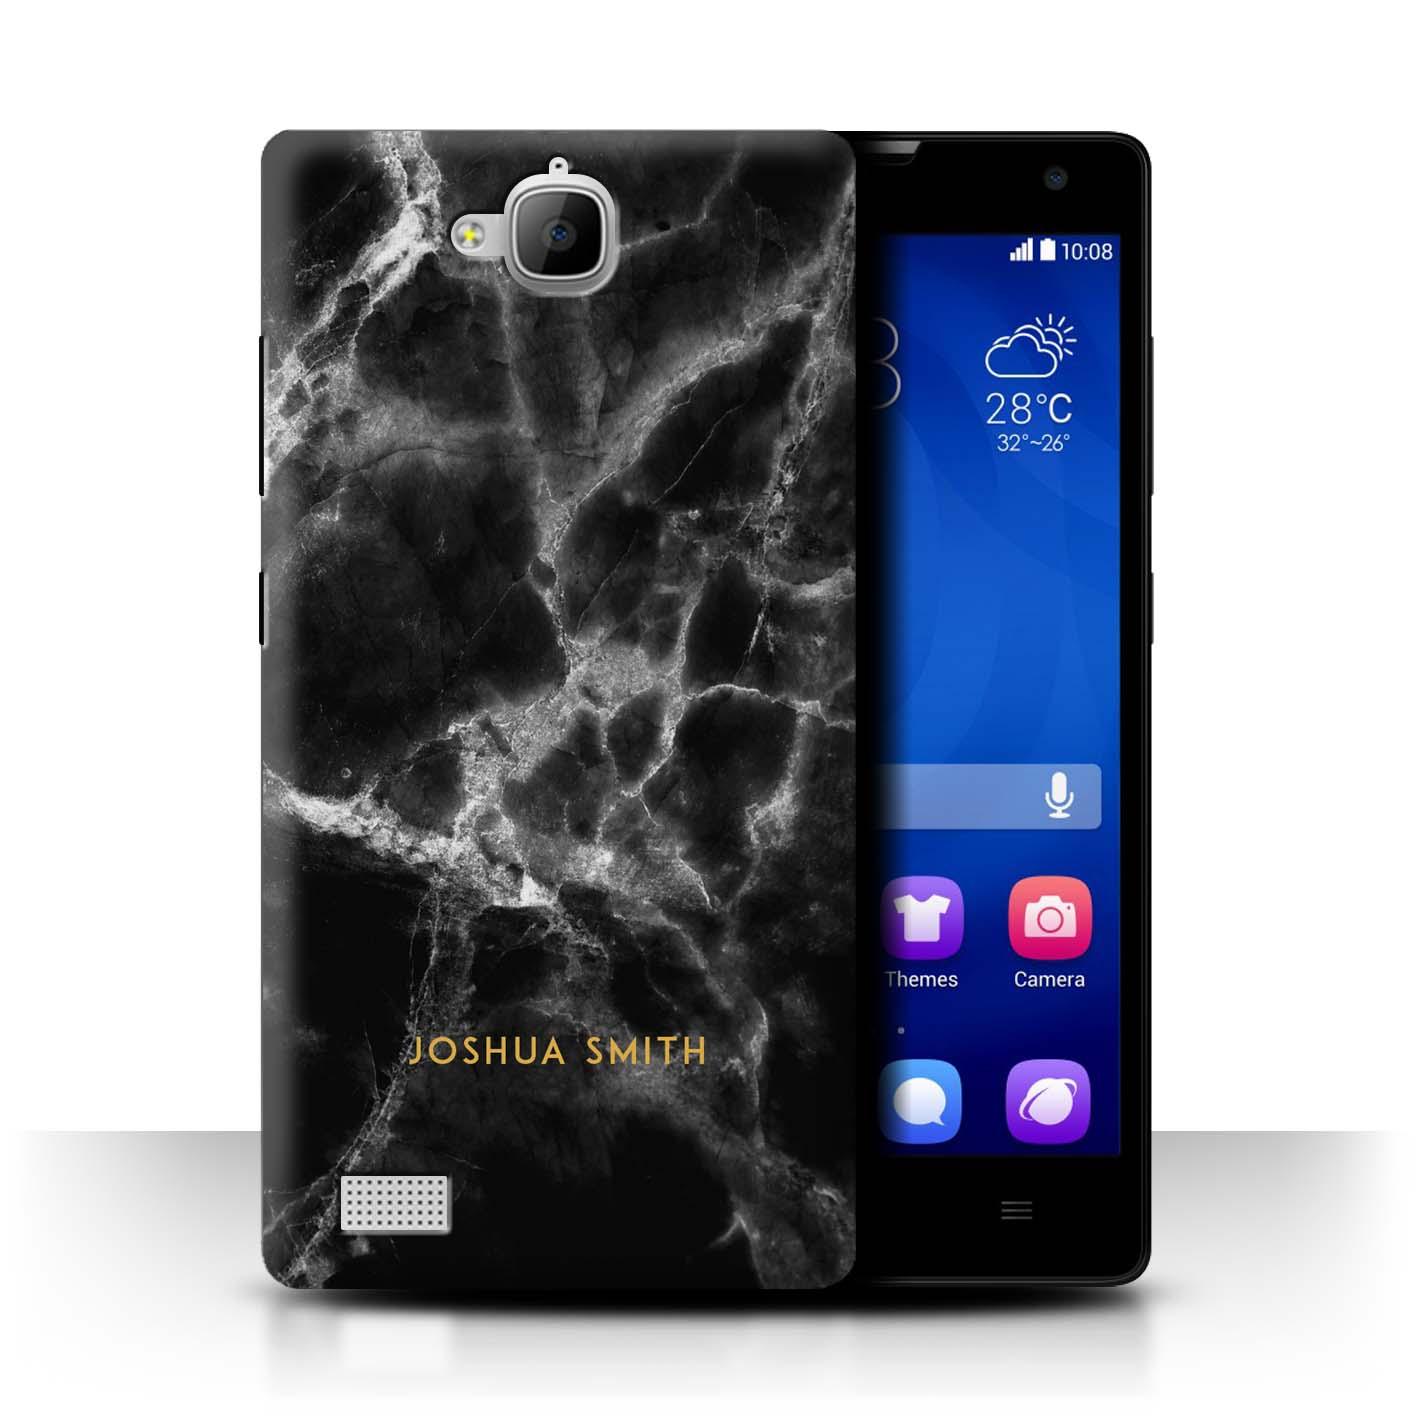 Personalizado-Marmol-fundas-para-telefono-PROTECTOR-Huawei-Honor-INICIAL